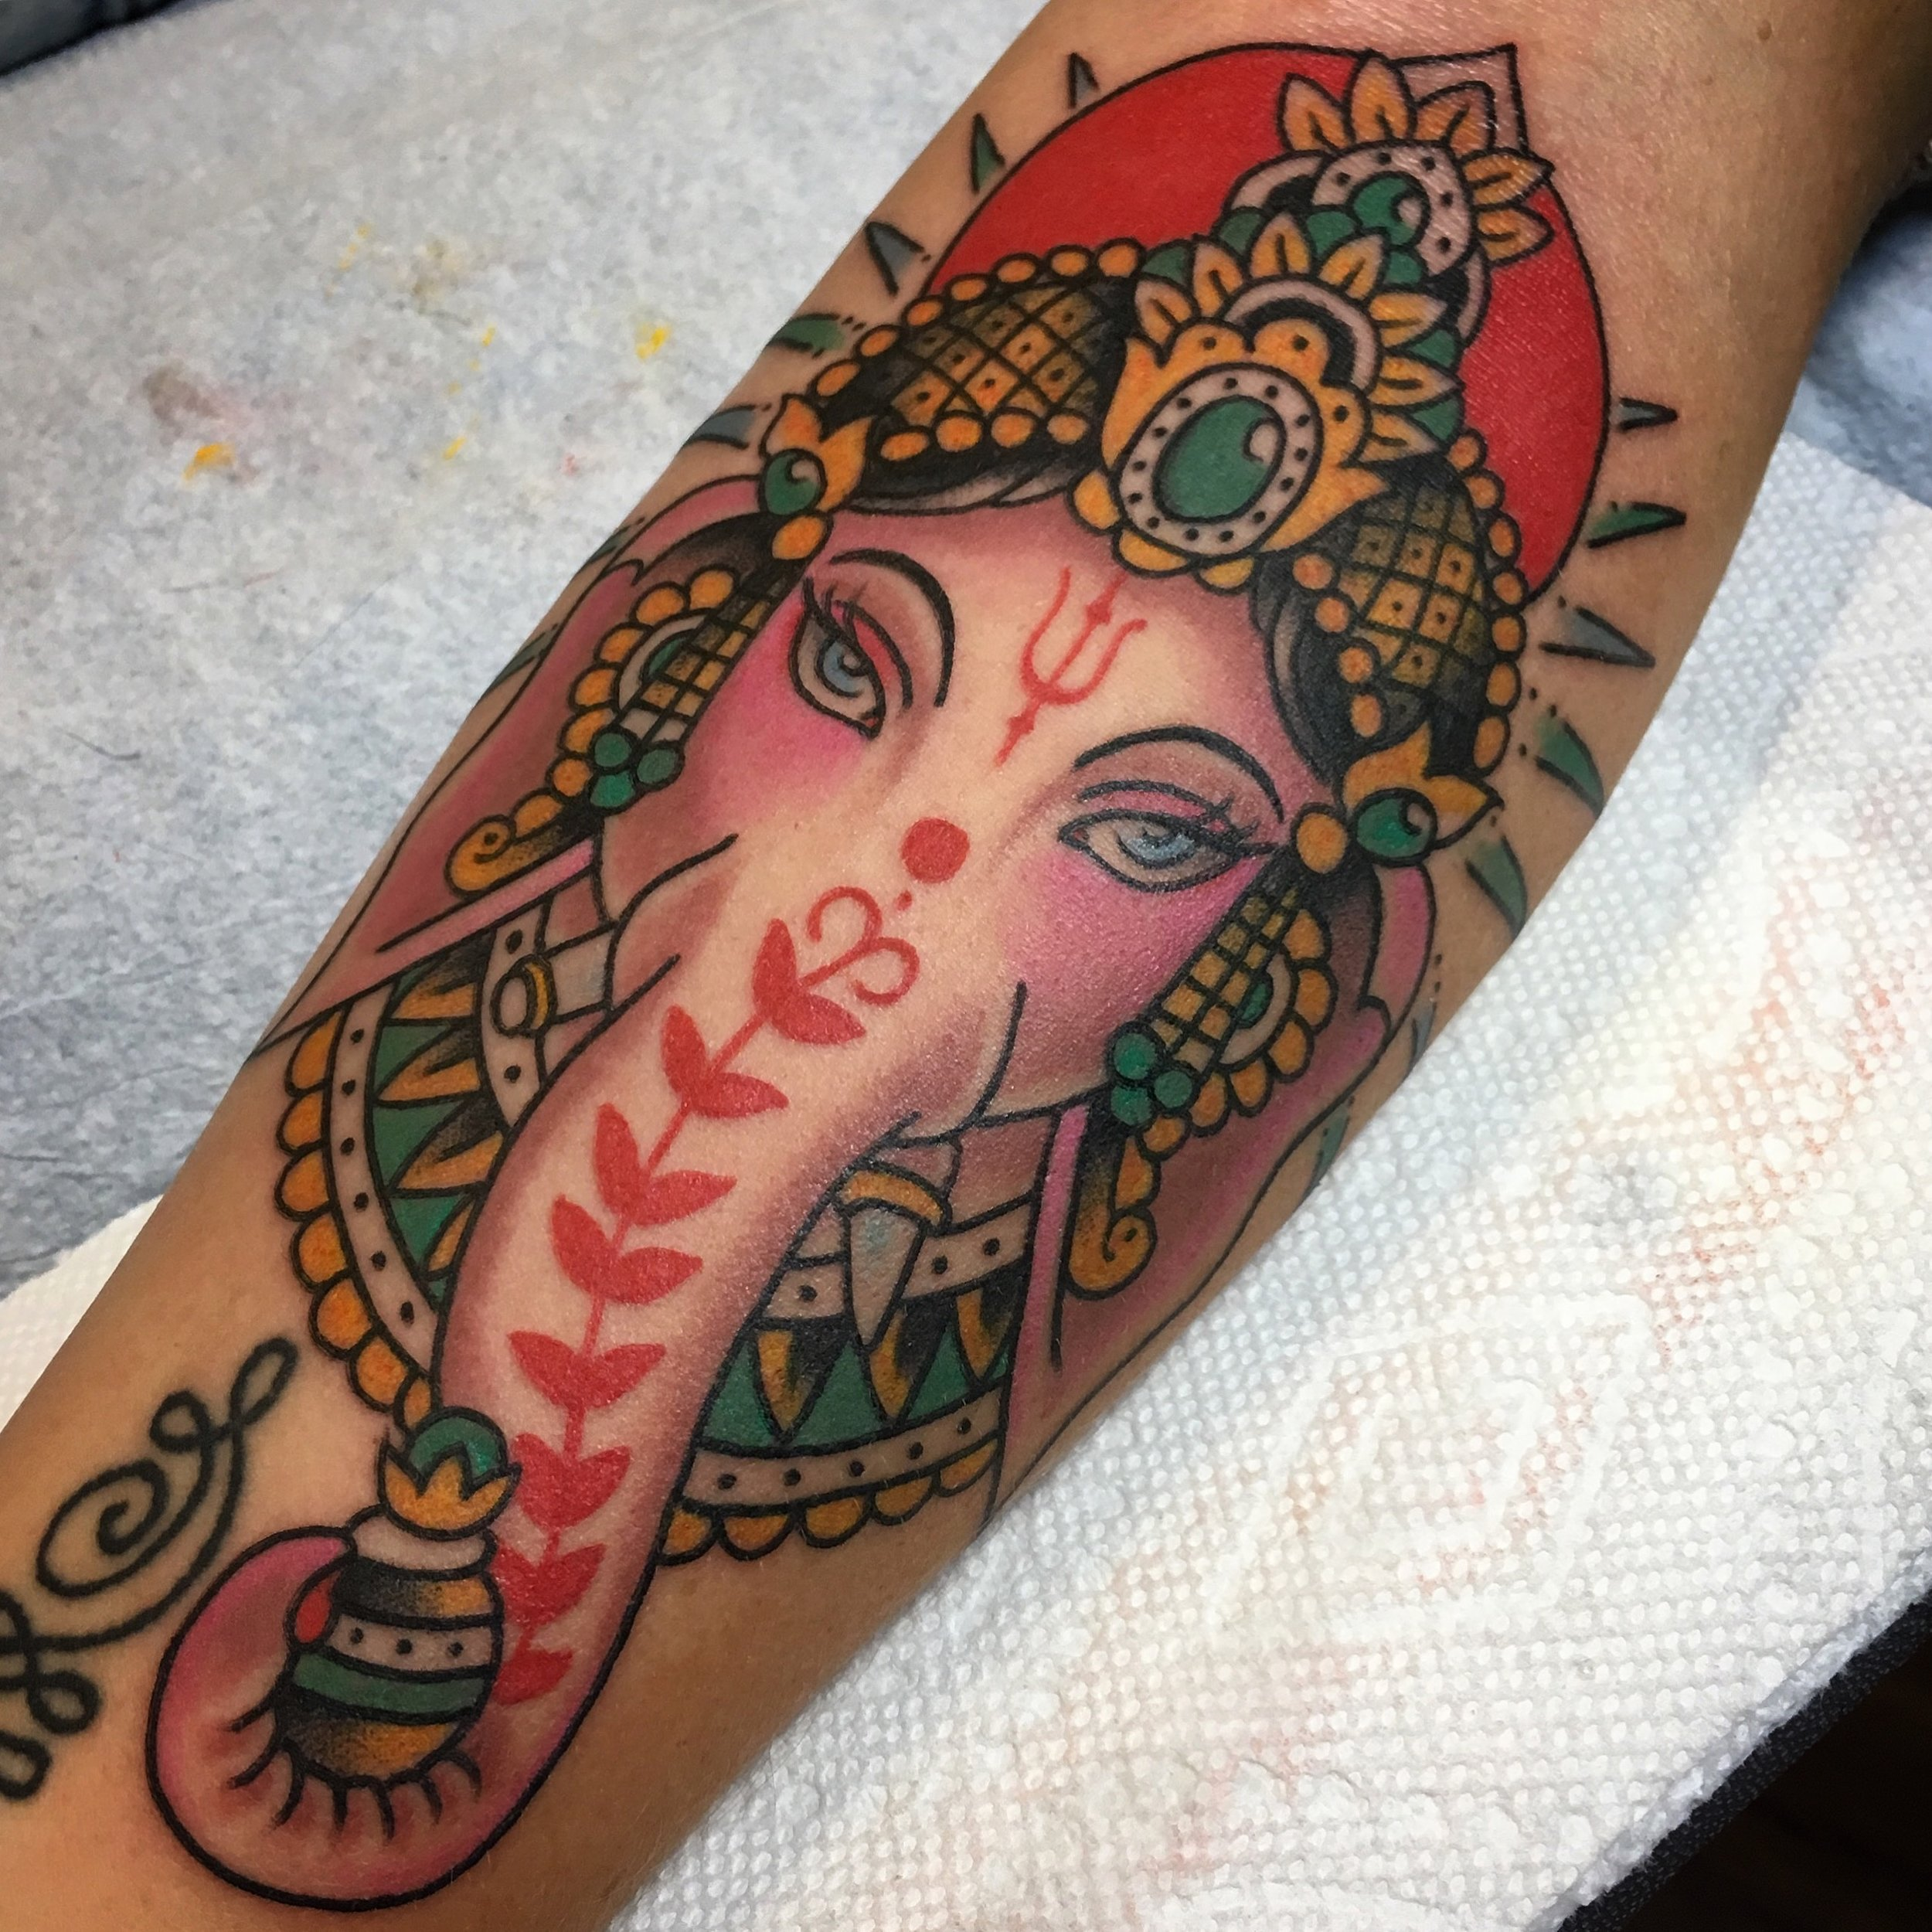 Jennalee-Mahan-Tattoo-Mandala-Elephant.JPG